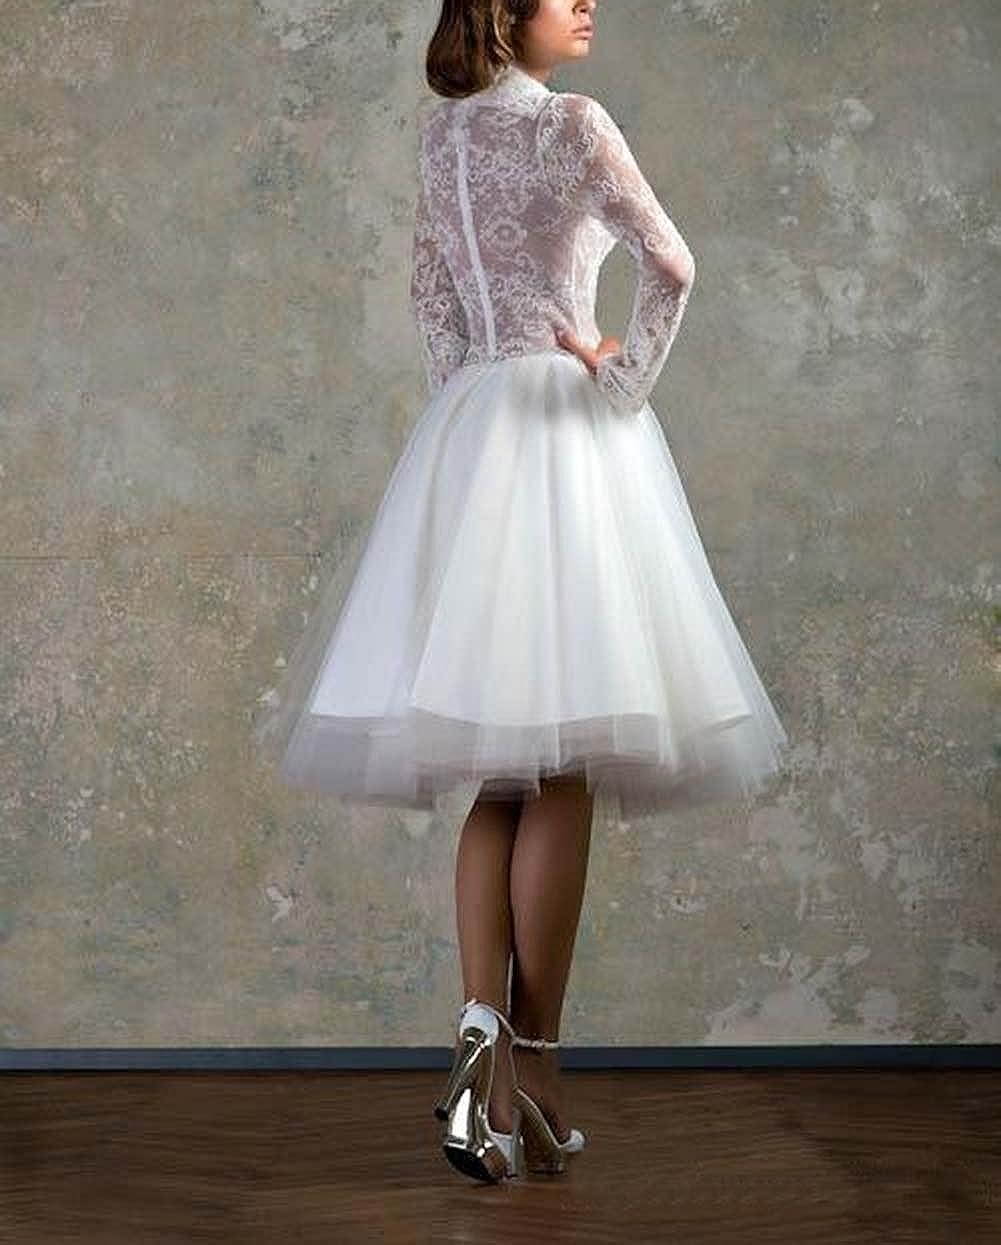 Dreamdress Womens Deep V-Neck Lace Long Sleeve Short Wedding Dresses